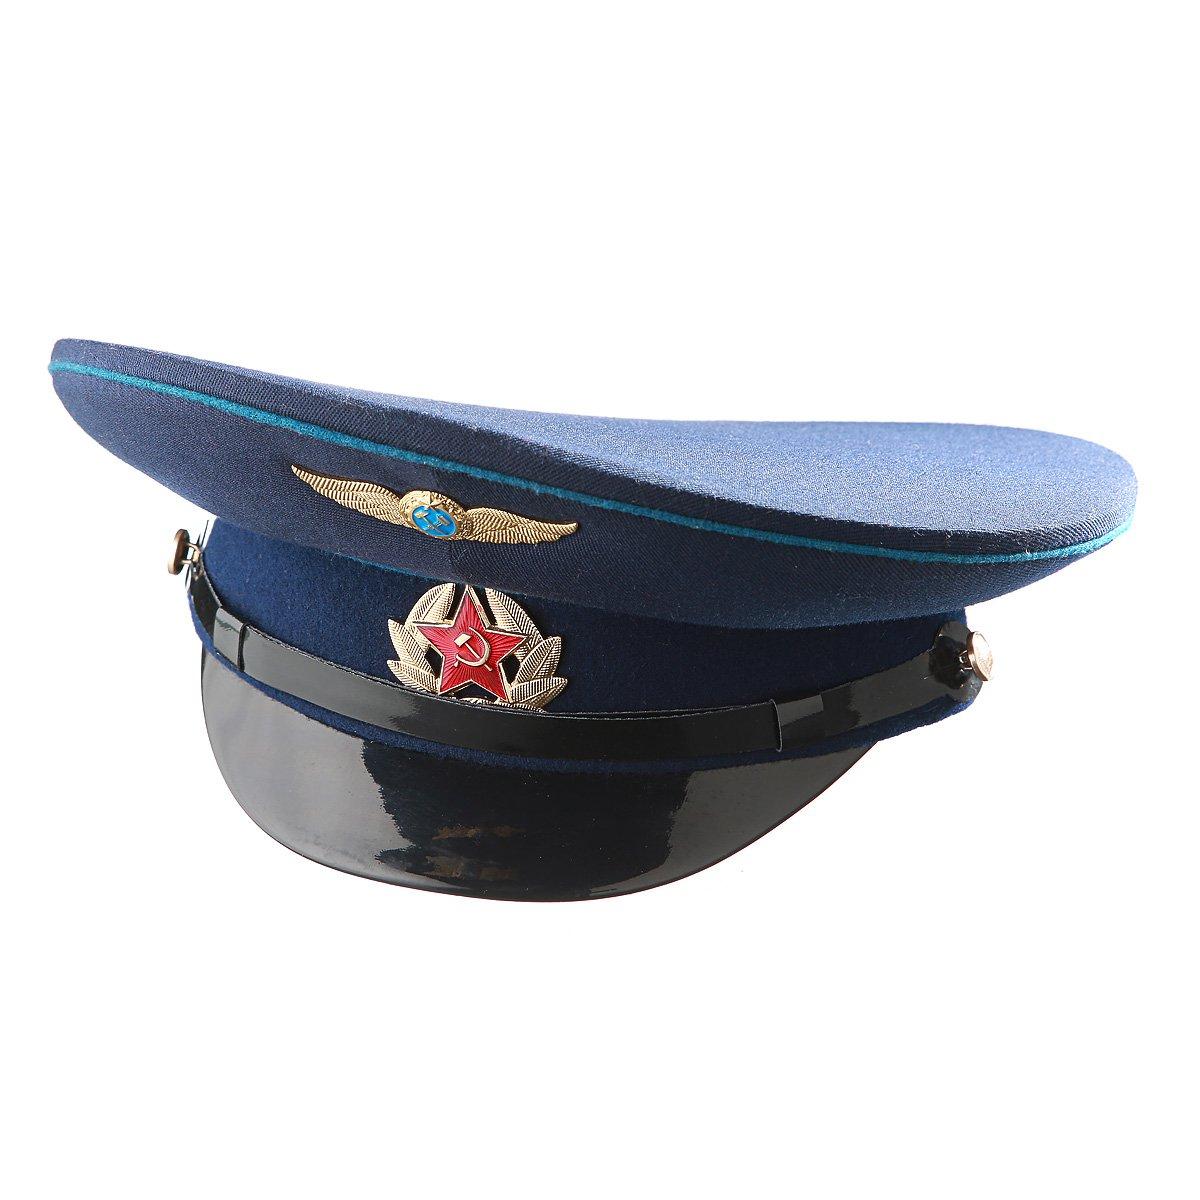 d4e5839a6 Cheap Officer Cap, find Officer Cap deals on line at Alibaba.com